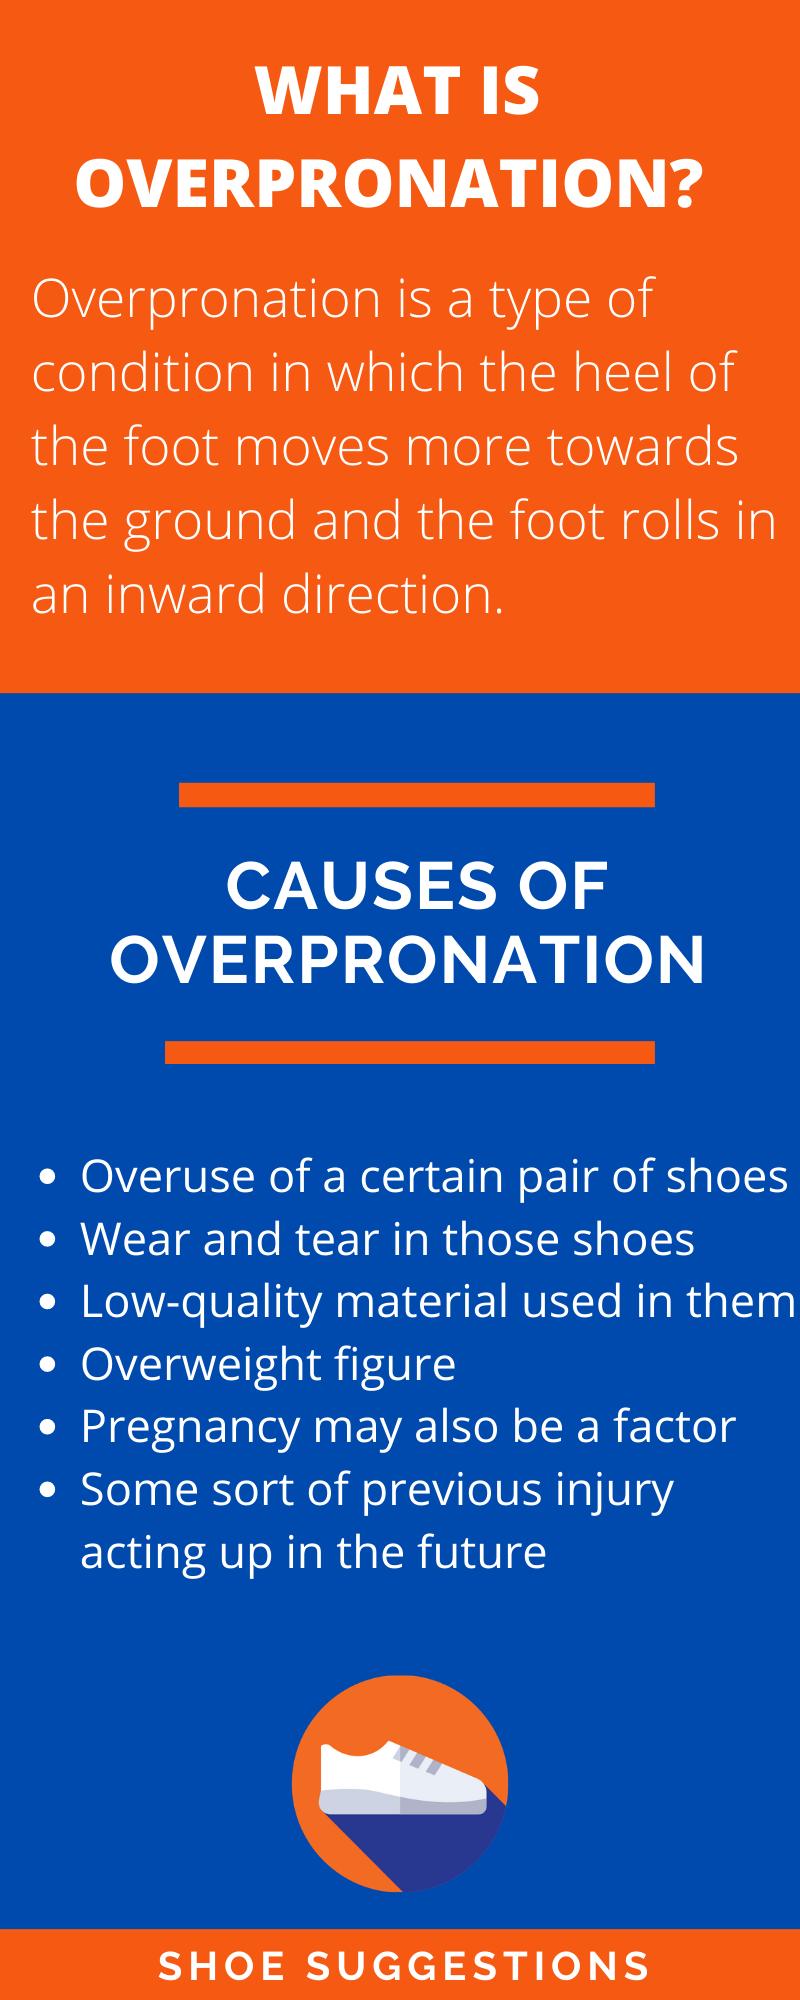 Causes of Overpronation